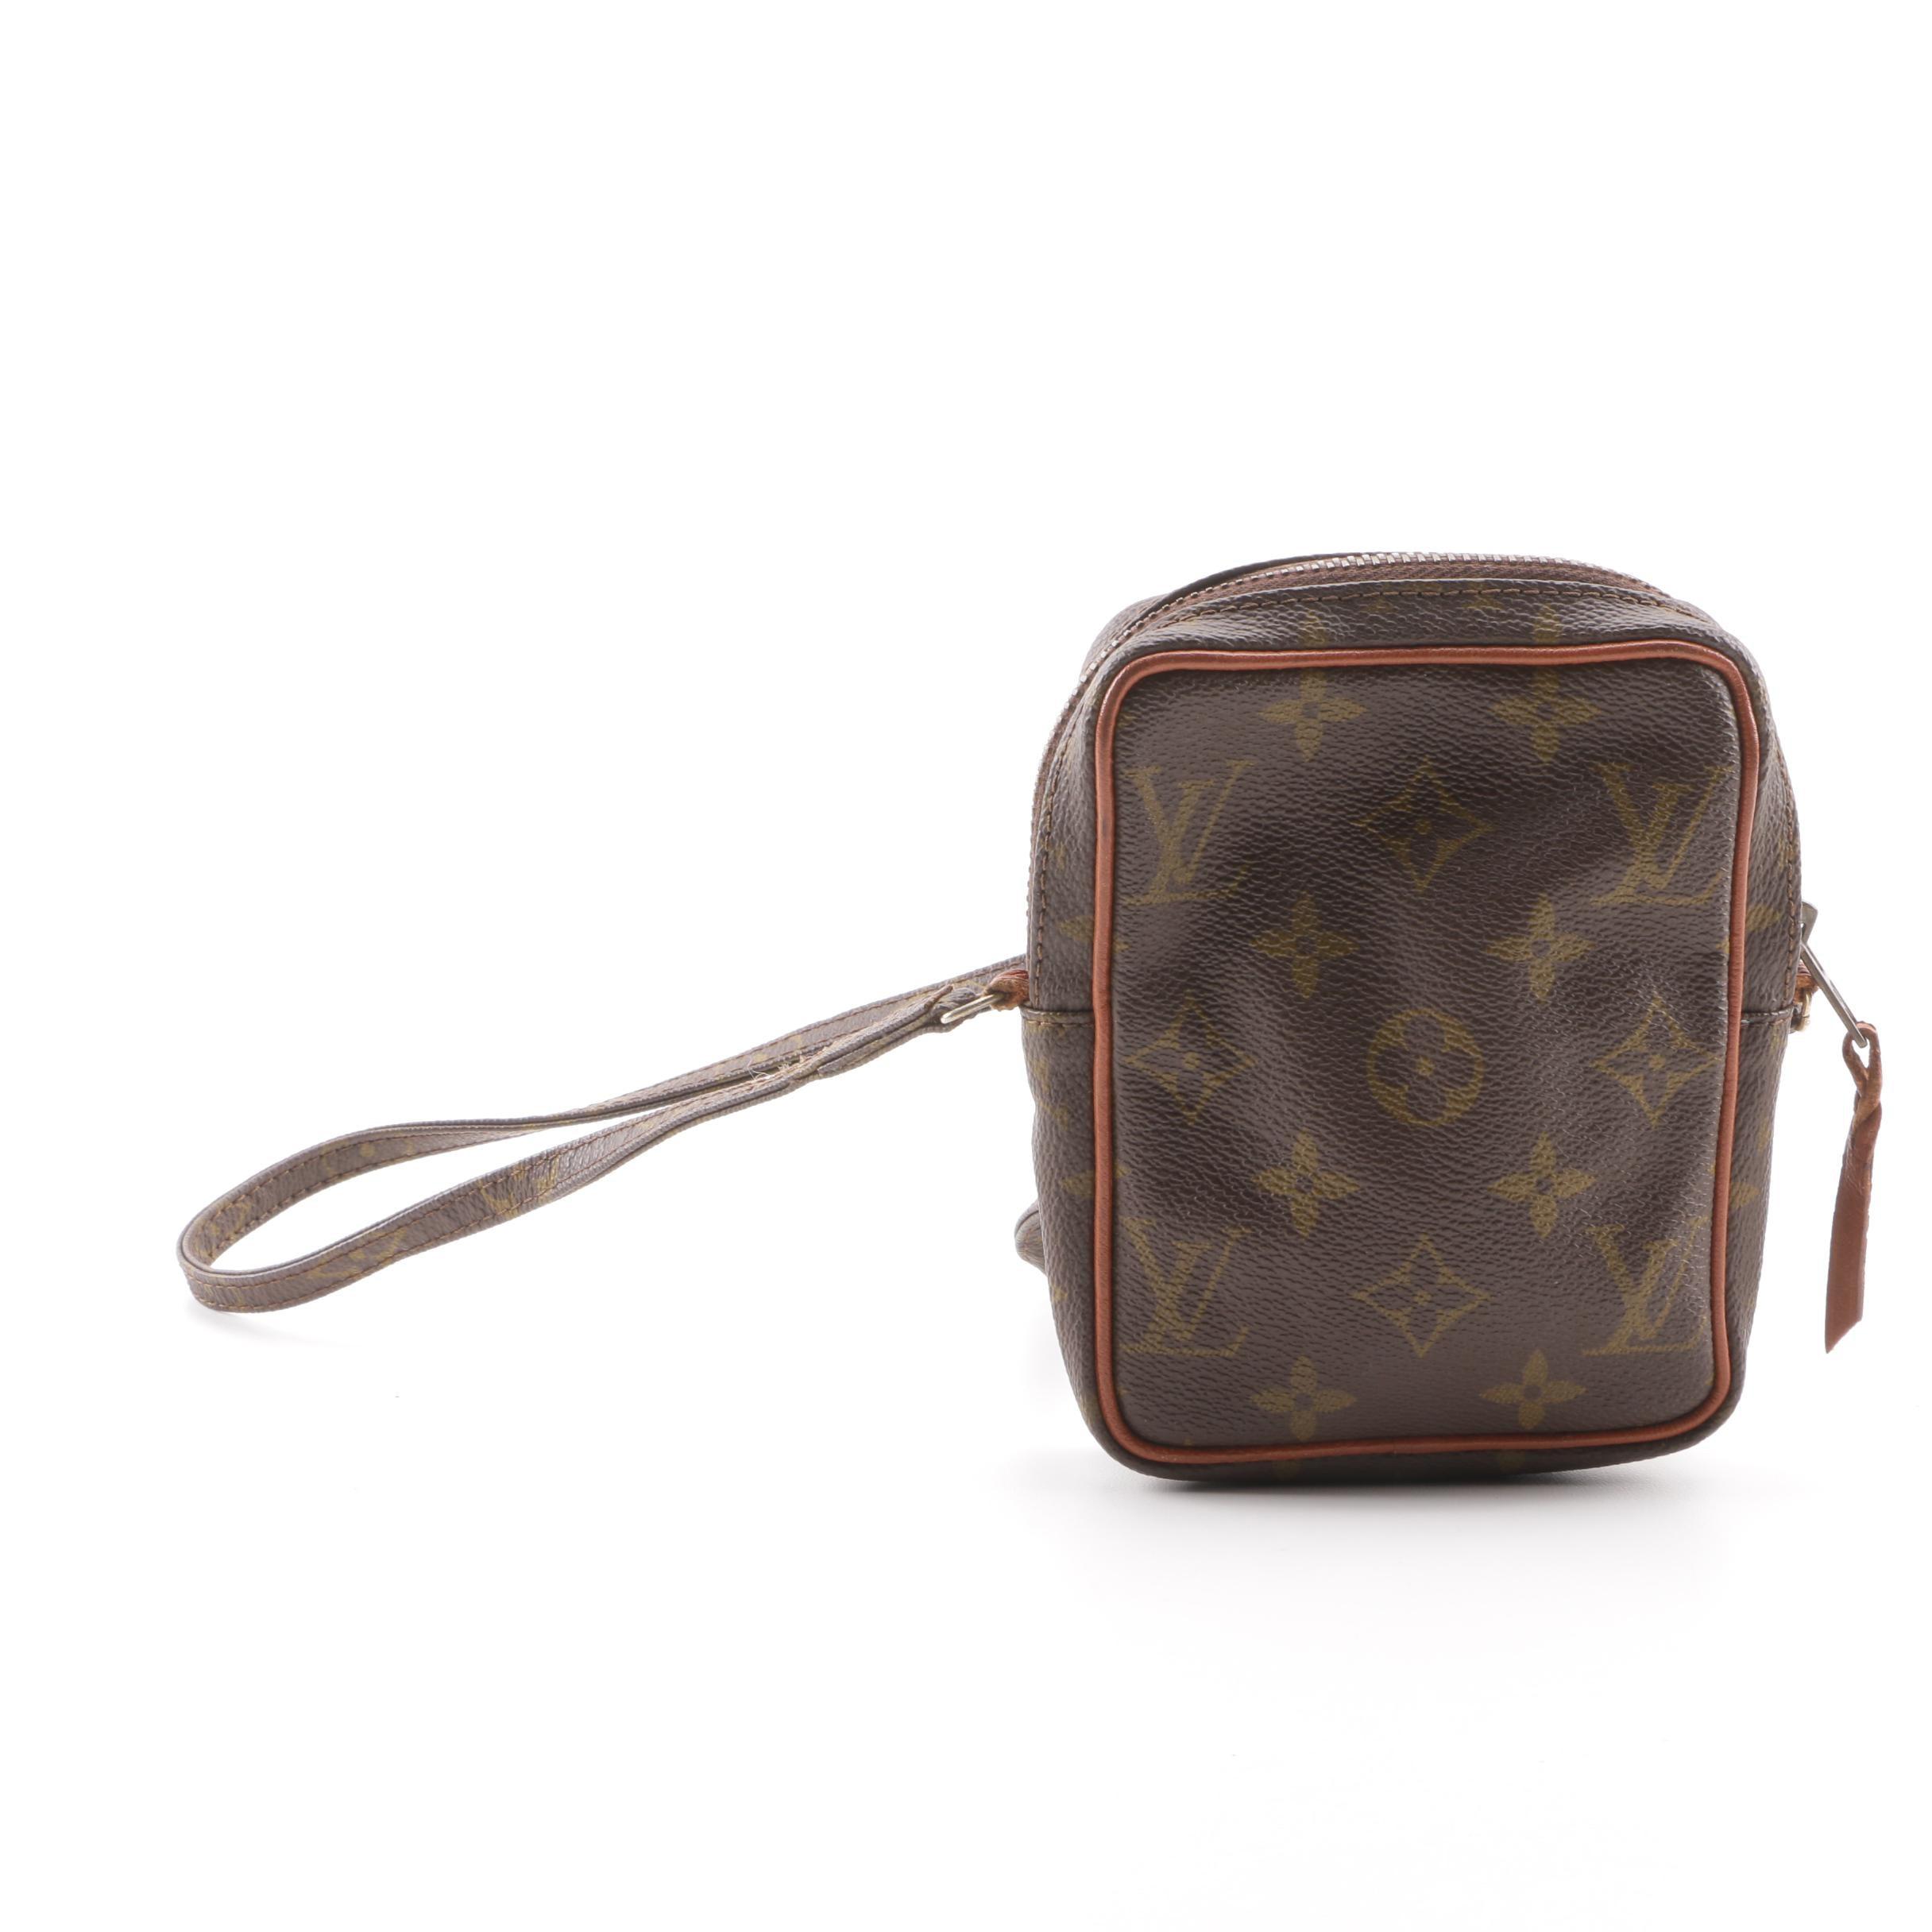 1980s Louis Vuitton Monogram Canvas Camera Bag